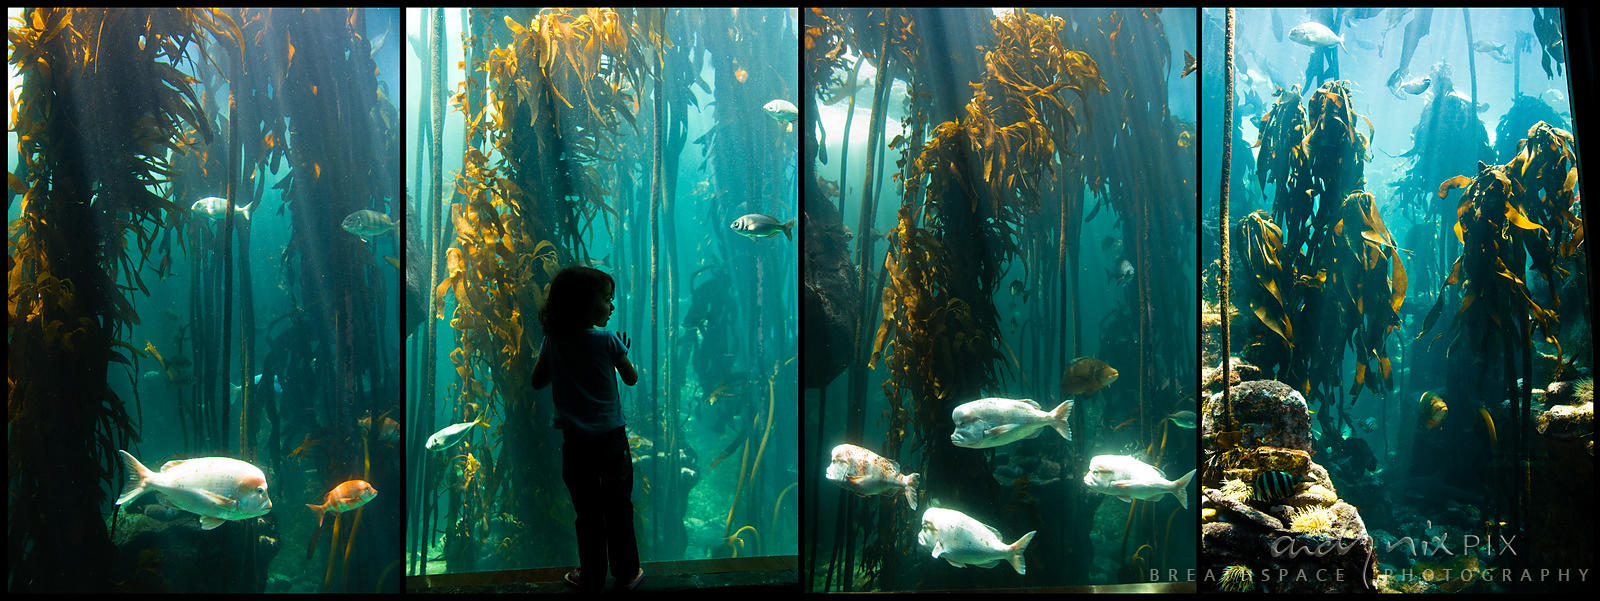 Freshwater aquarium fish cape town - Two Oceans Aquarium Cape Town South Africa A Little Girl Looks Through The